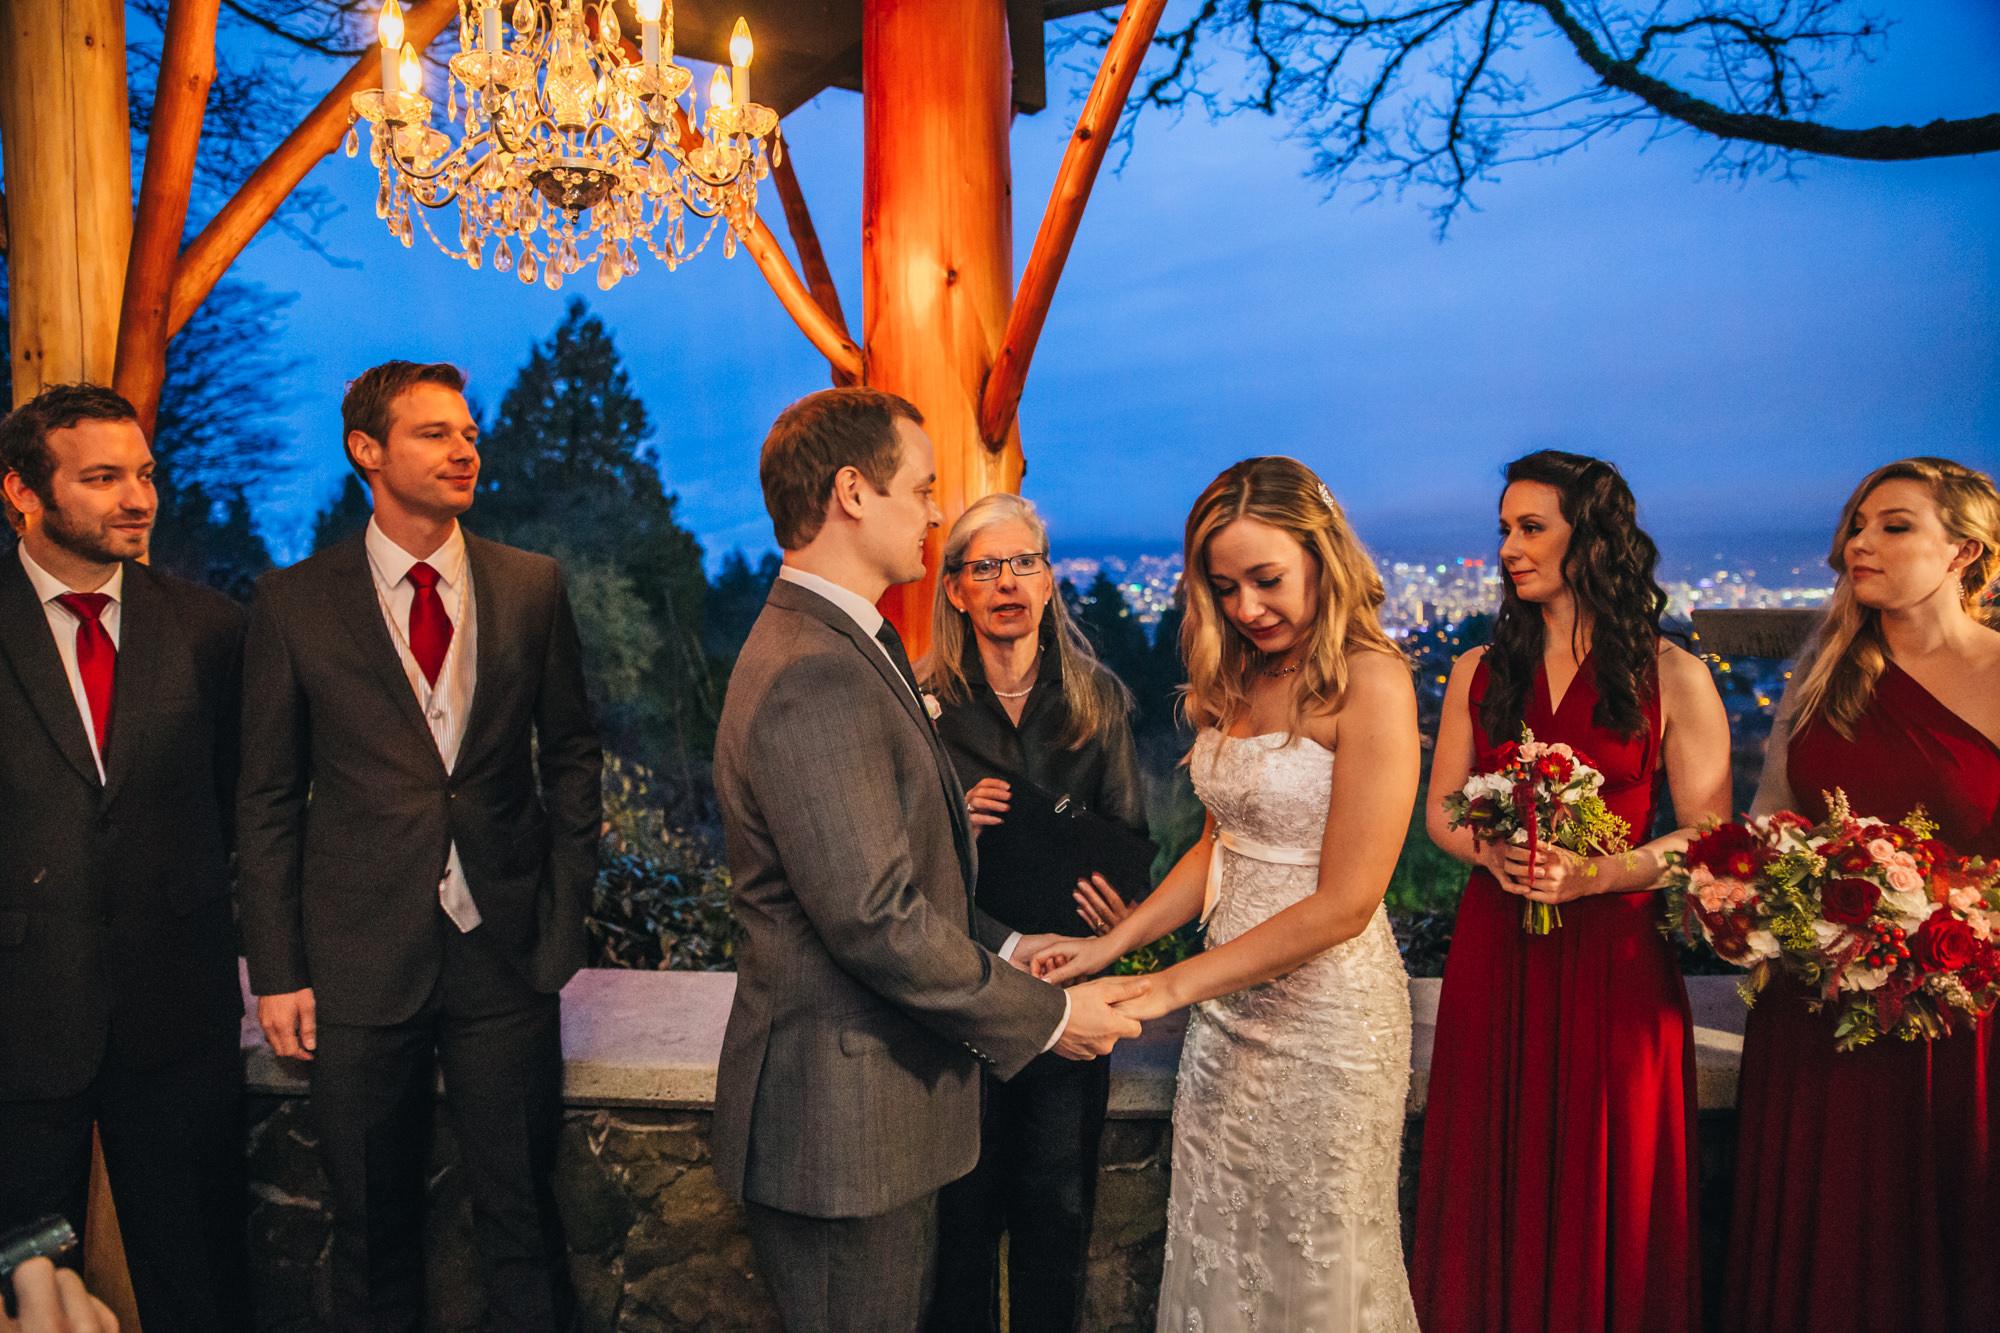 21-seasons-in-the-park-wedding-ceremony.jpg